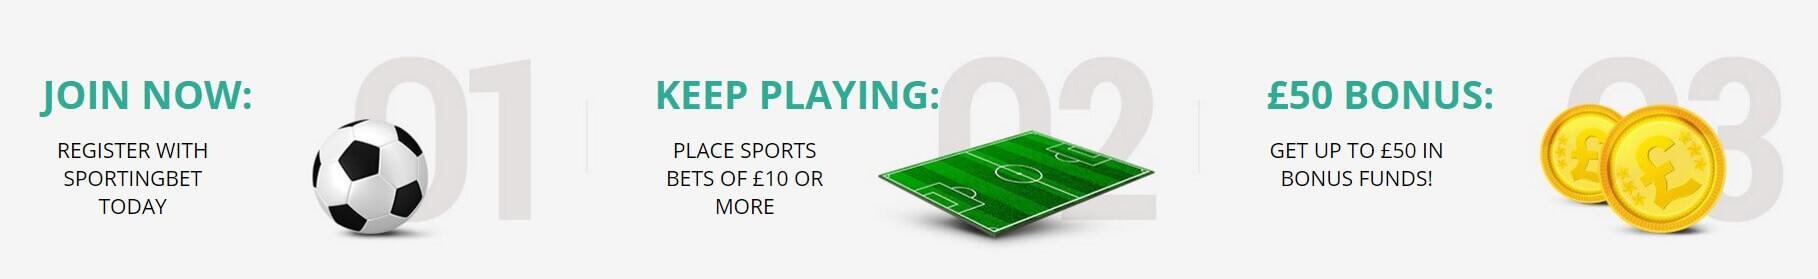 Sportingbet Promotions